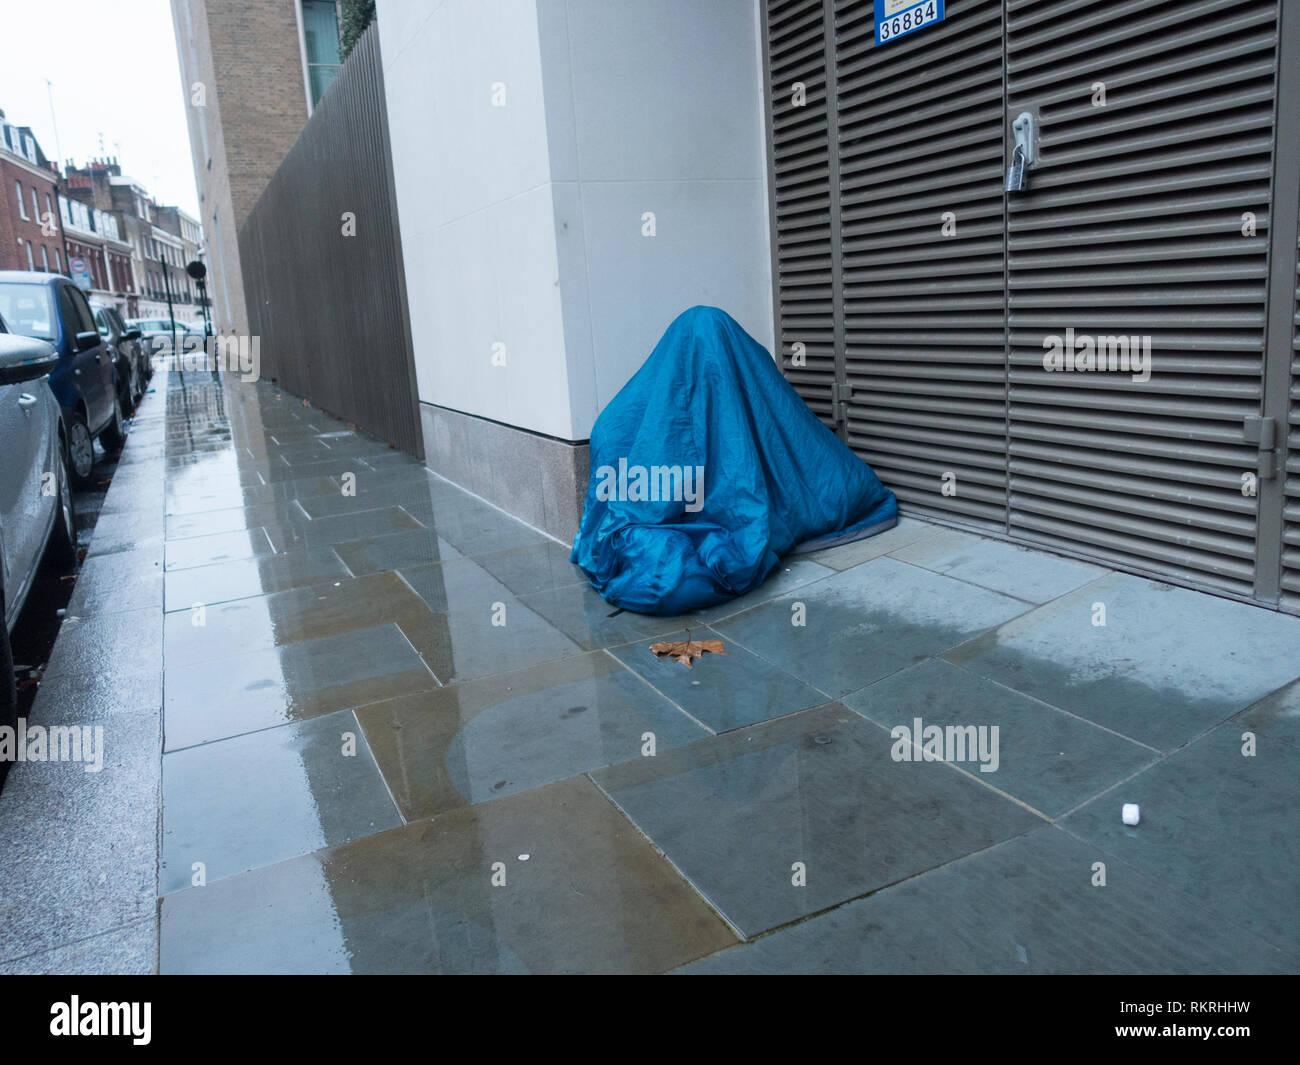 Homeless Person Under Sleeping Bag Stock Photo